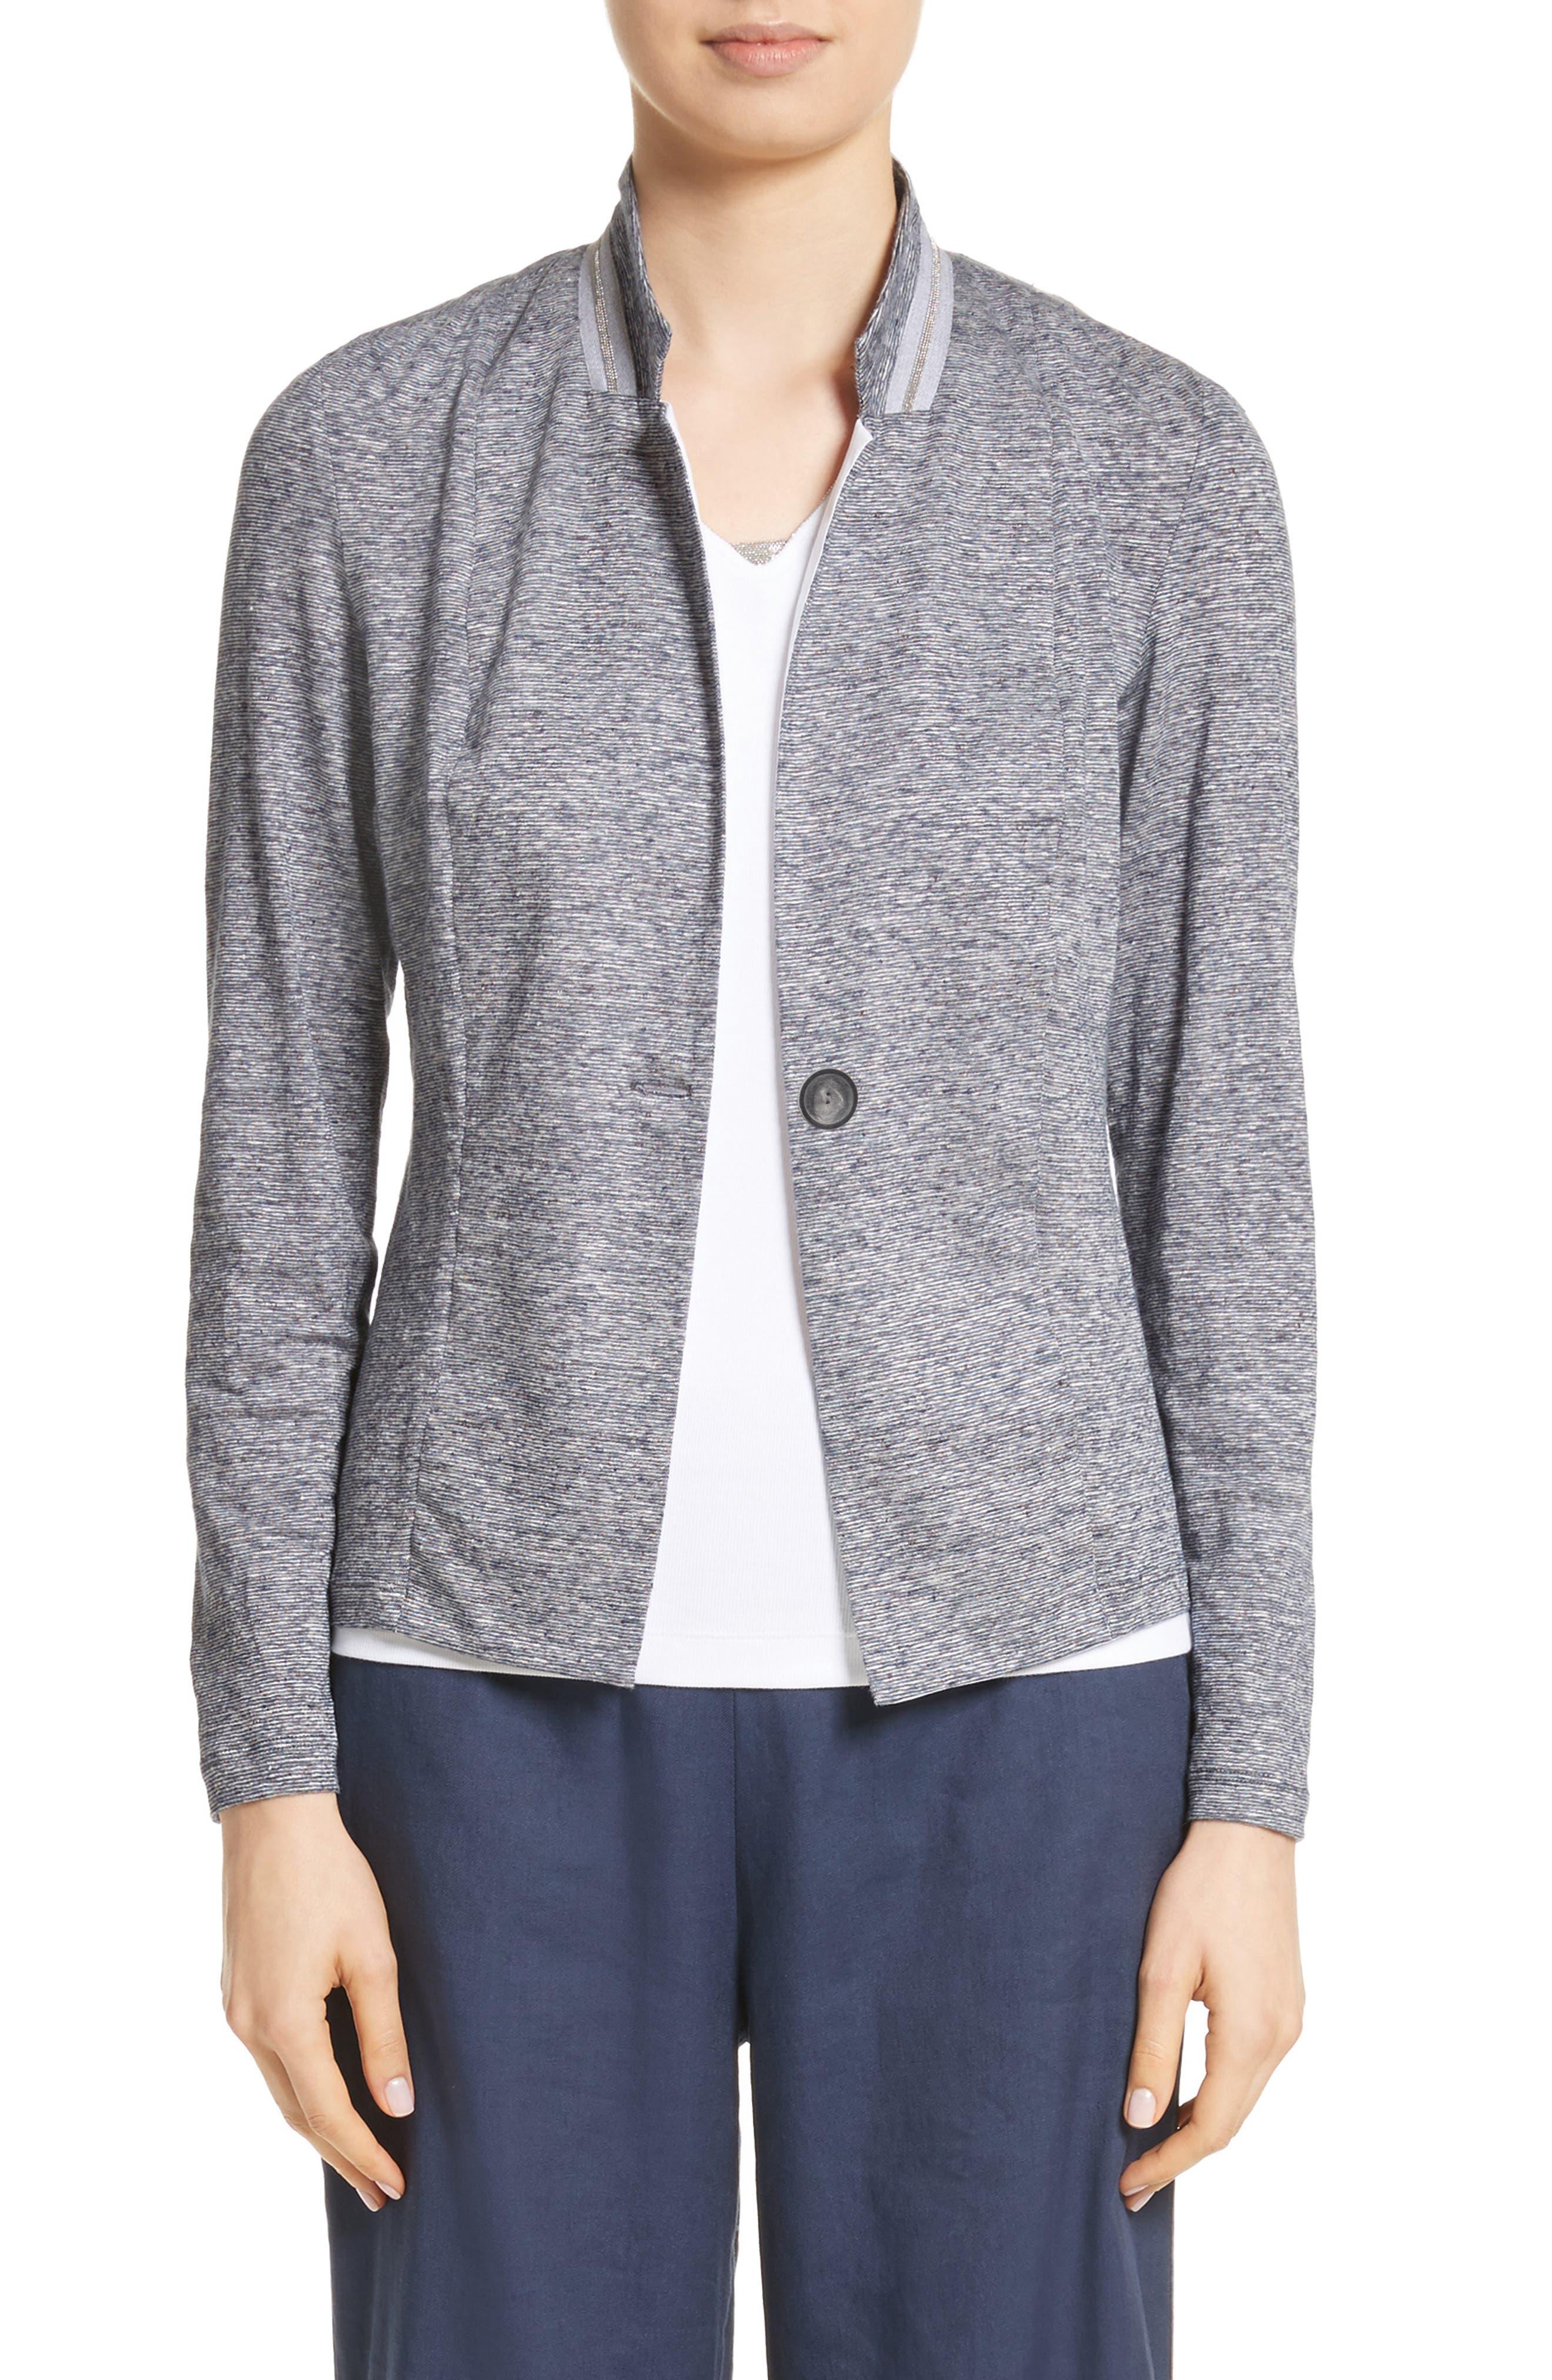 Grosgrain Stripe Jersey Jacket,                             Main thumbnail 1, color,                             400